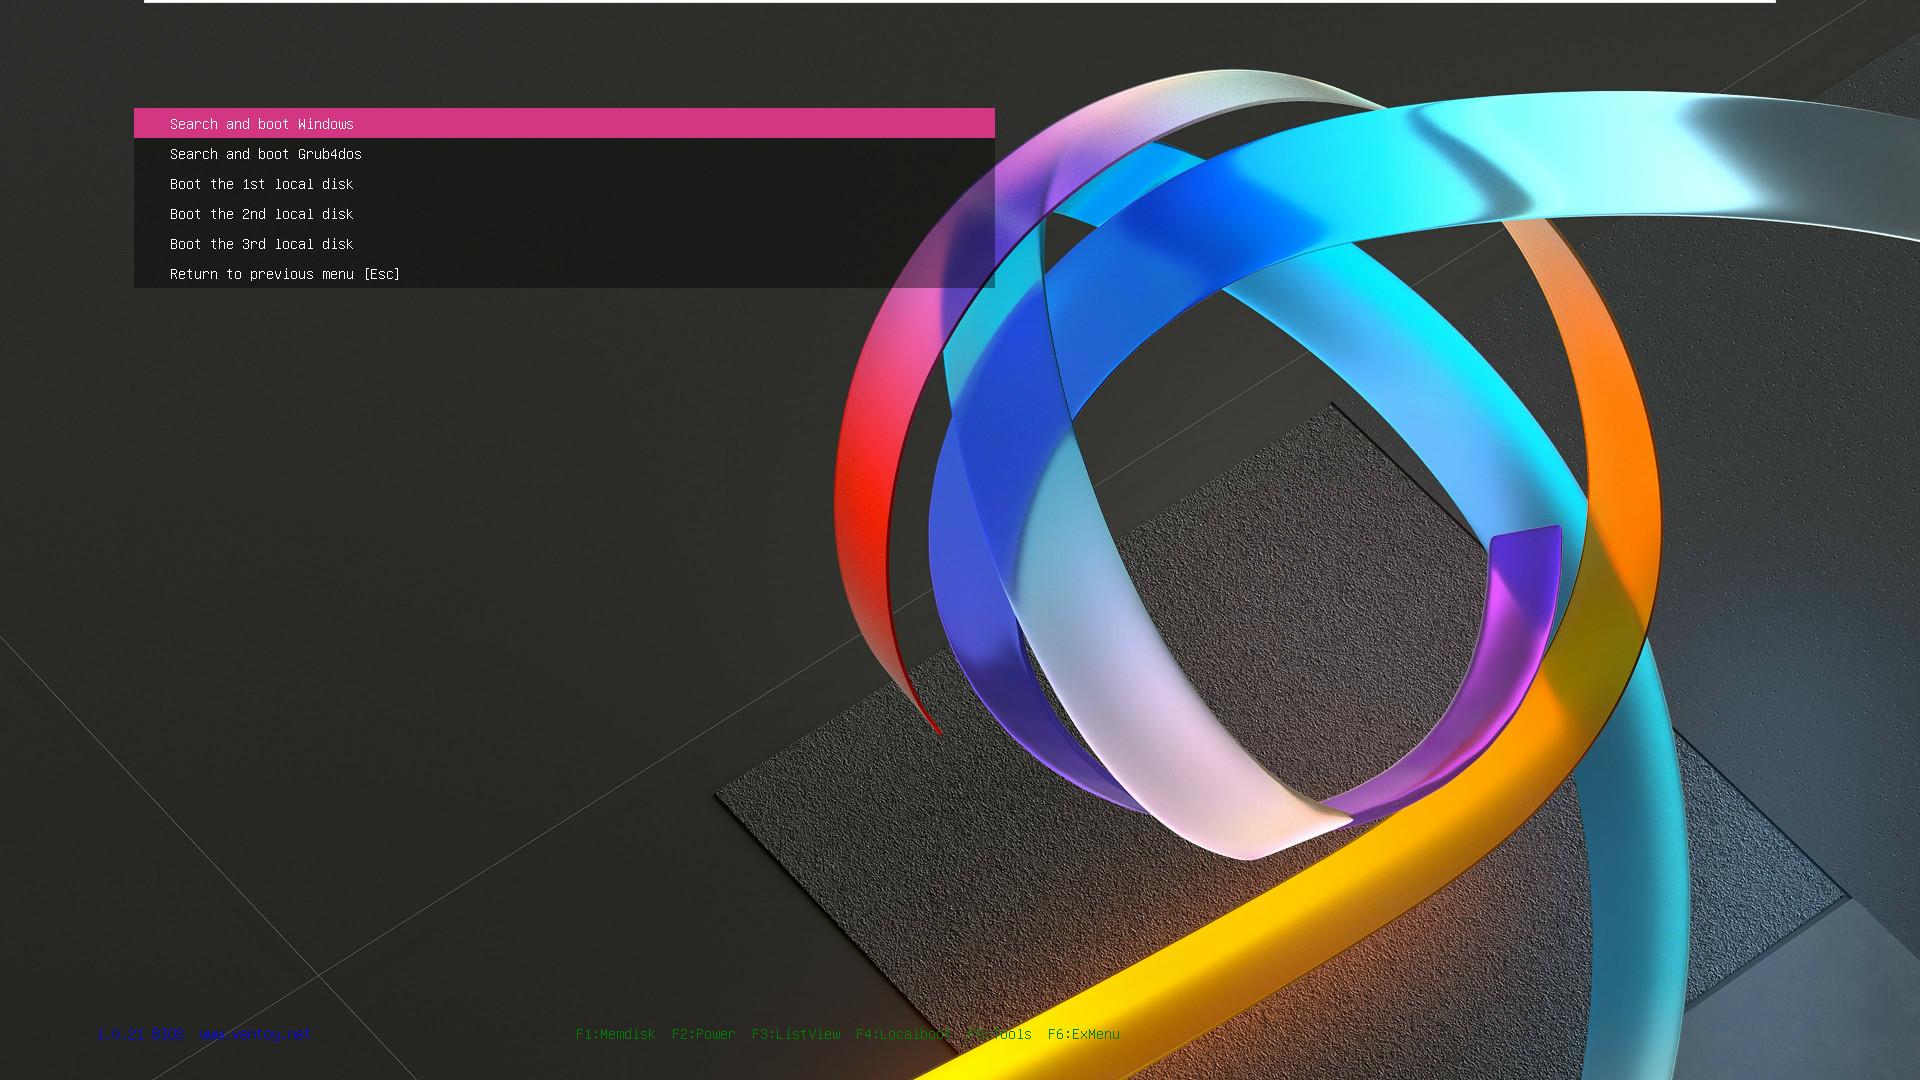 AIO Boot와 Ventoy 하나의 디스크에 합치기 - bios 모드 연동 문제 해결 - Ventoy 기준으로 AIO Boot는 해결함 2020-09-18_080349.jpg